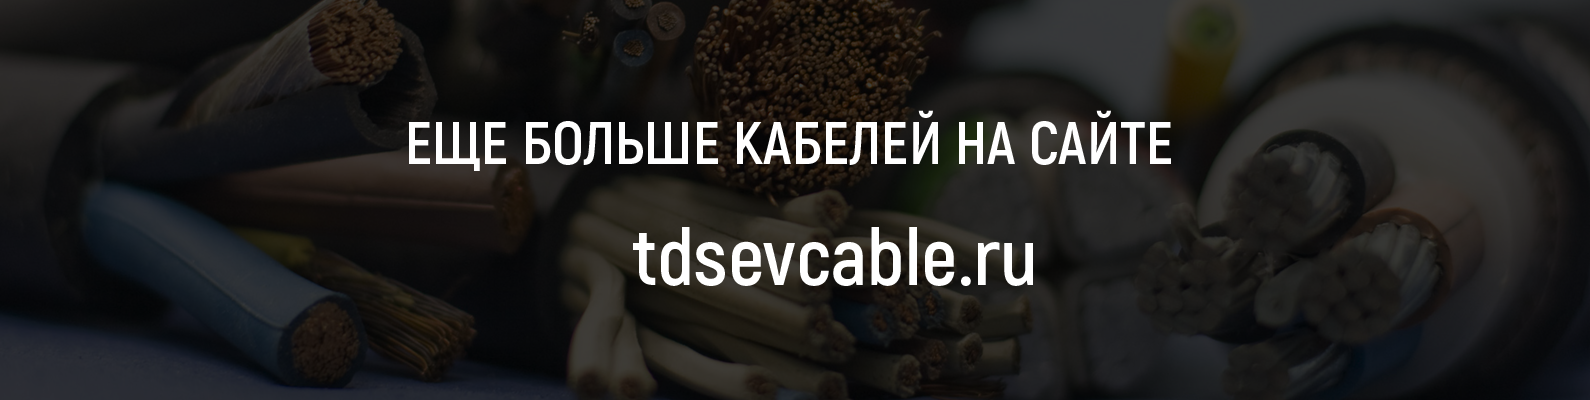 Москабель-Комплектация